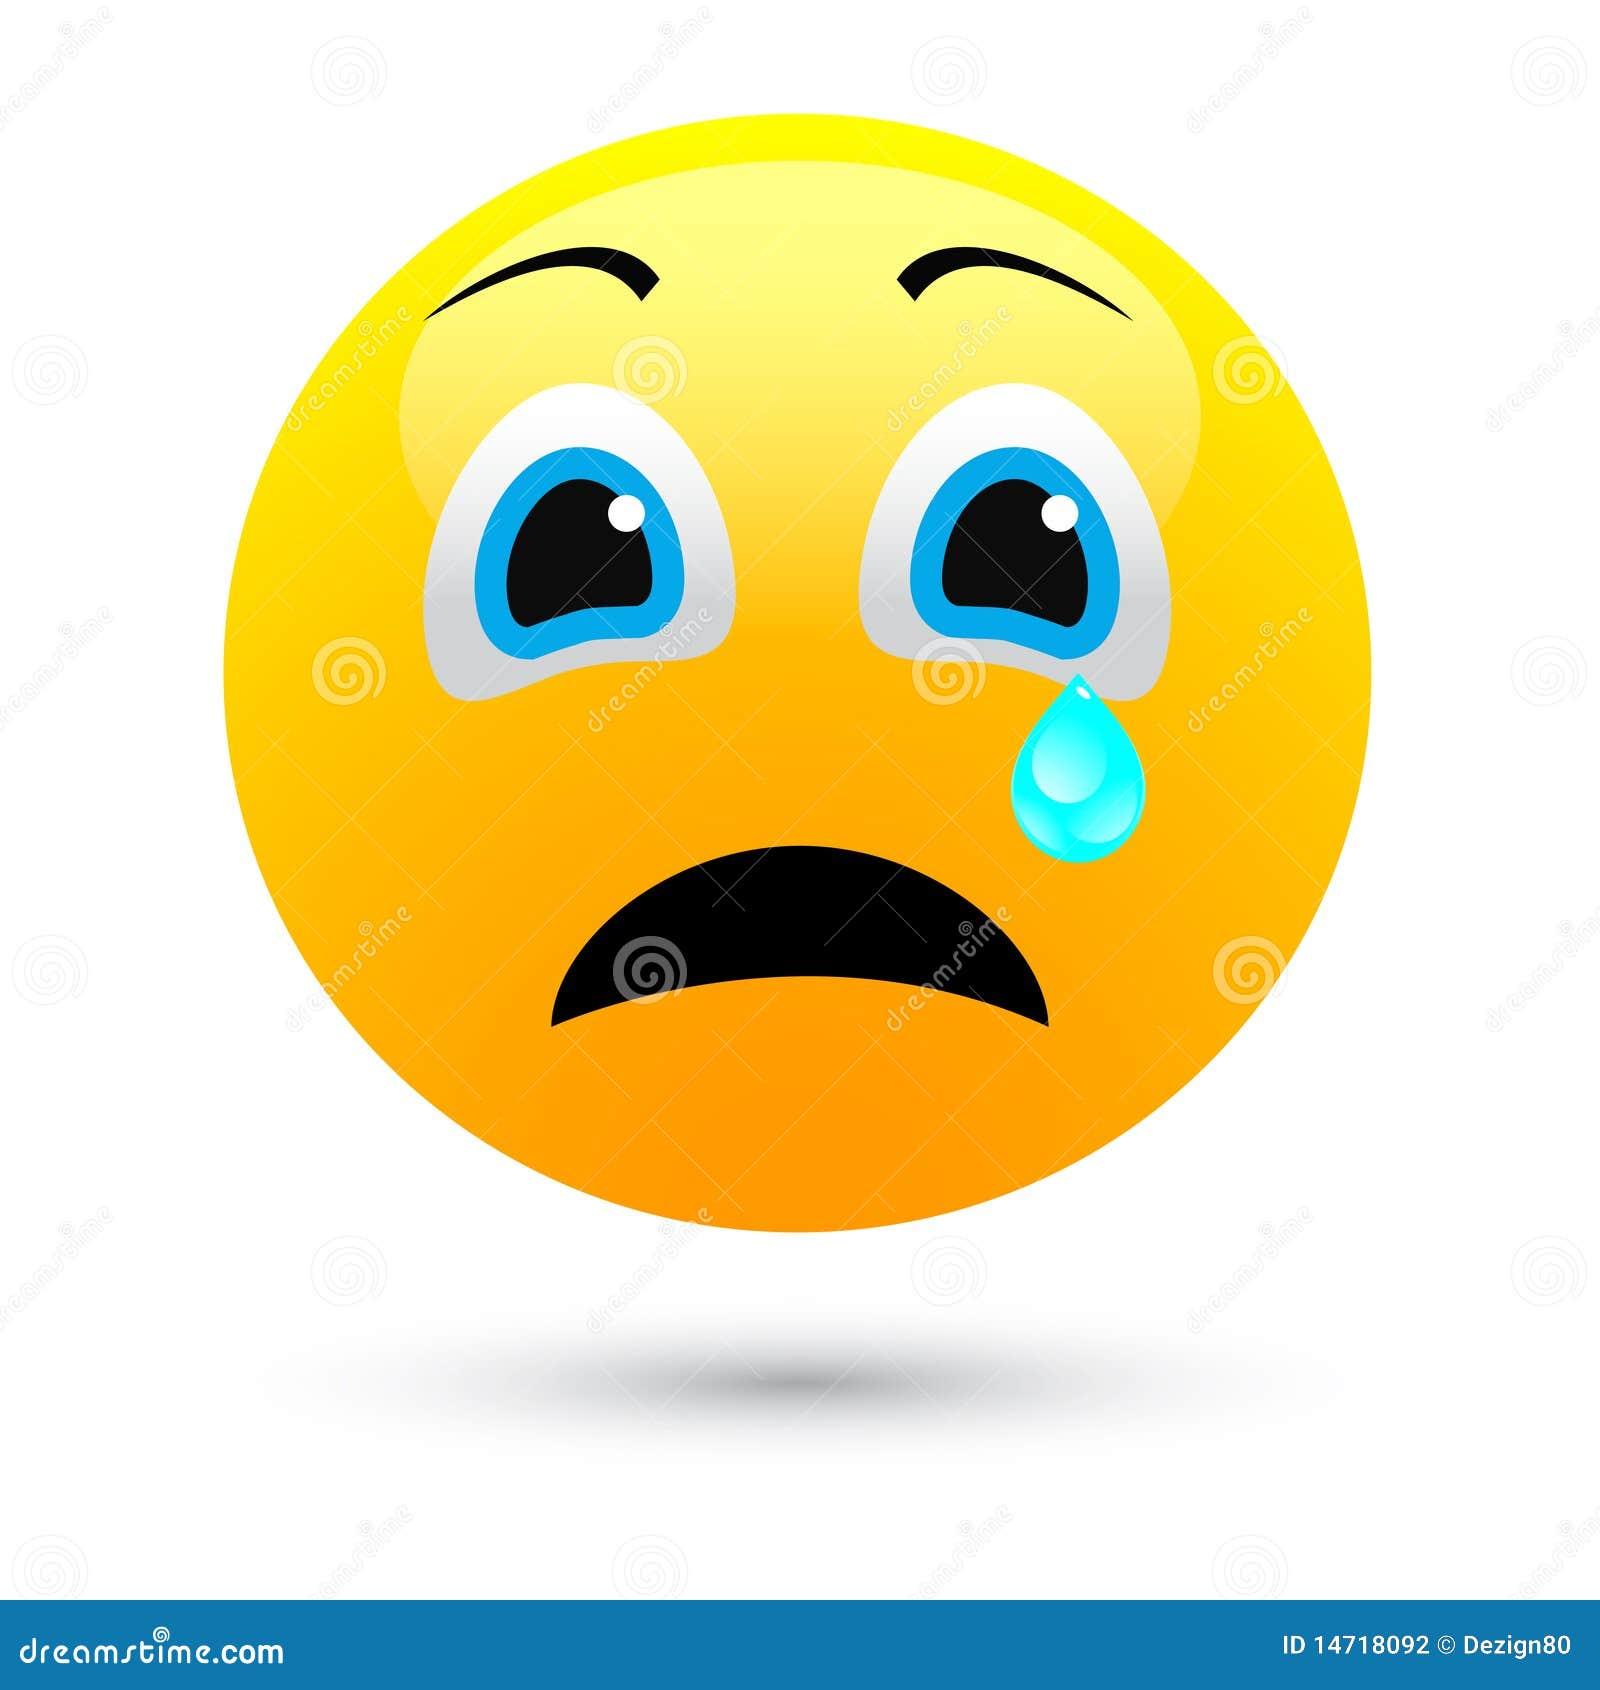 Sad: Human Face Sad Stock Vector. Illustration Of Sign, Human